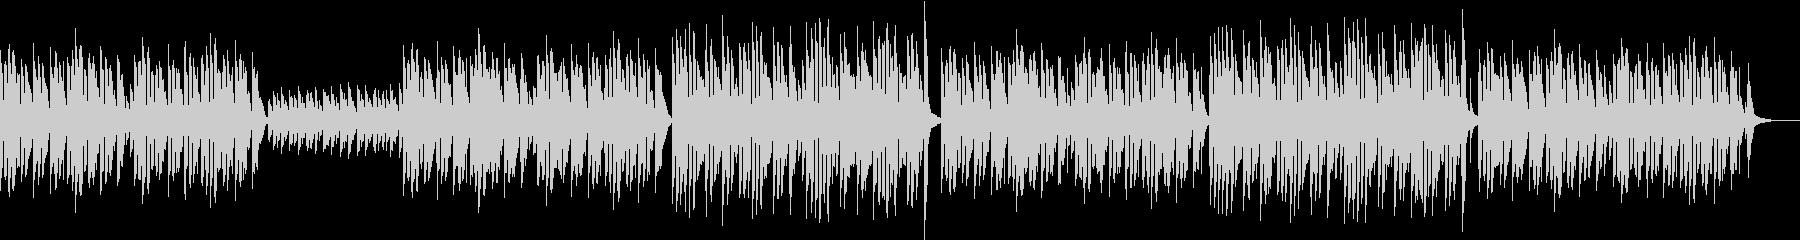 bpm104 キッズTikTok可愛い笛の未再生の波形